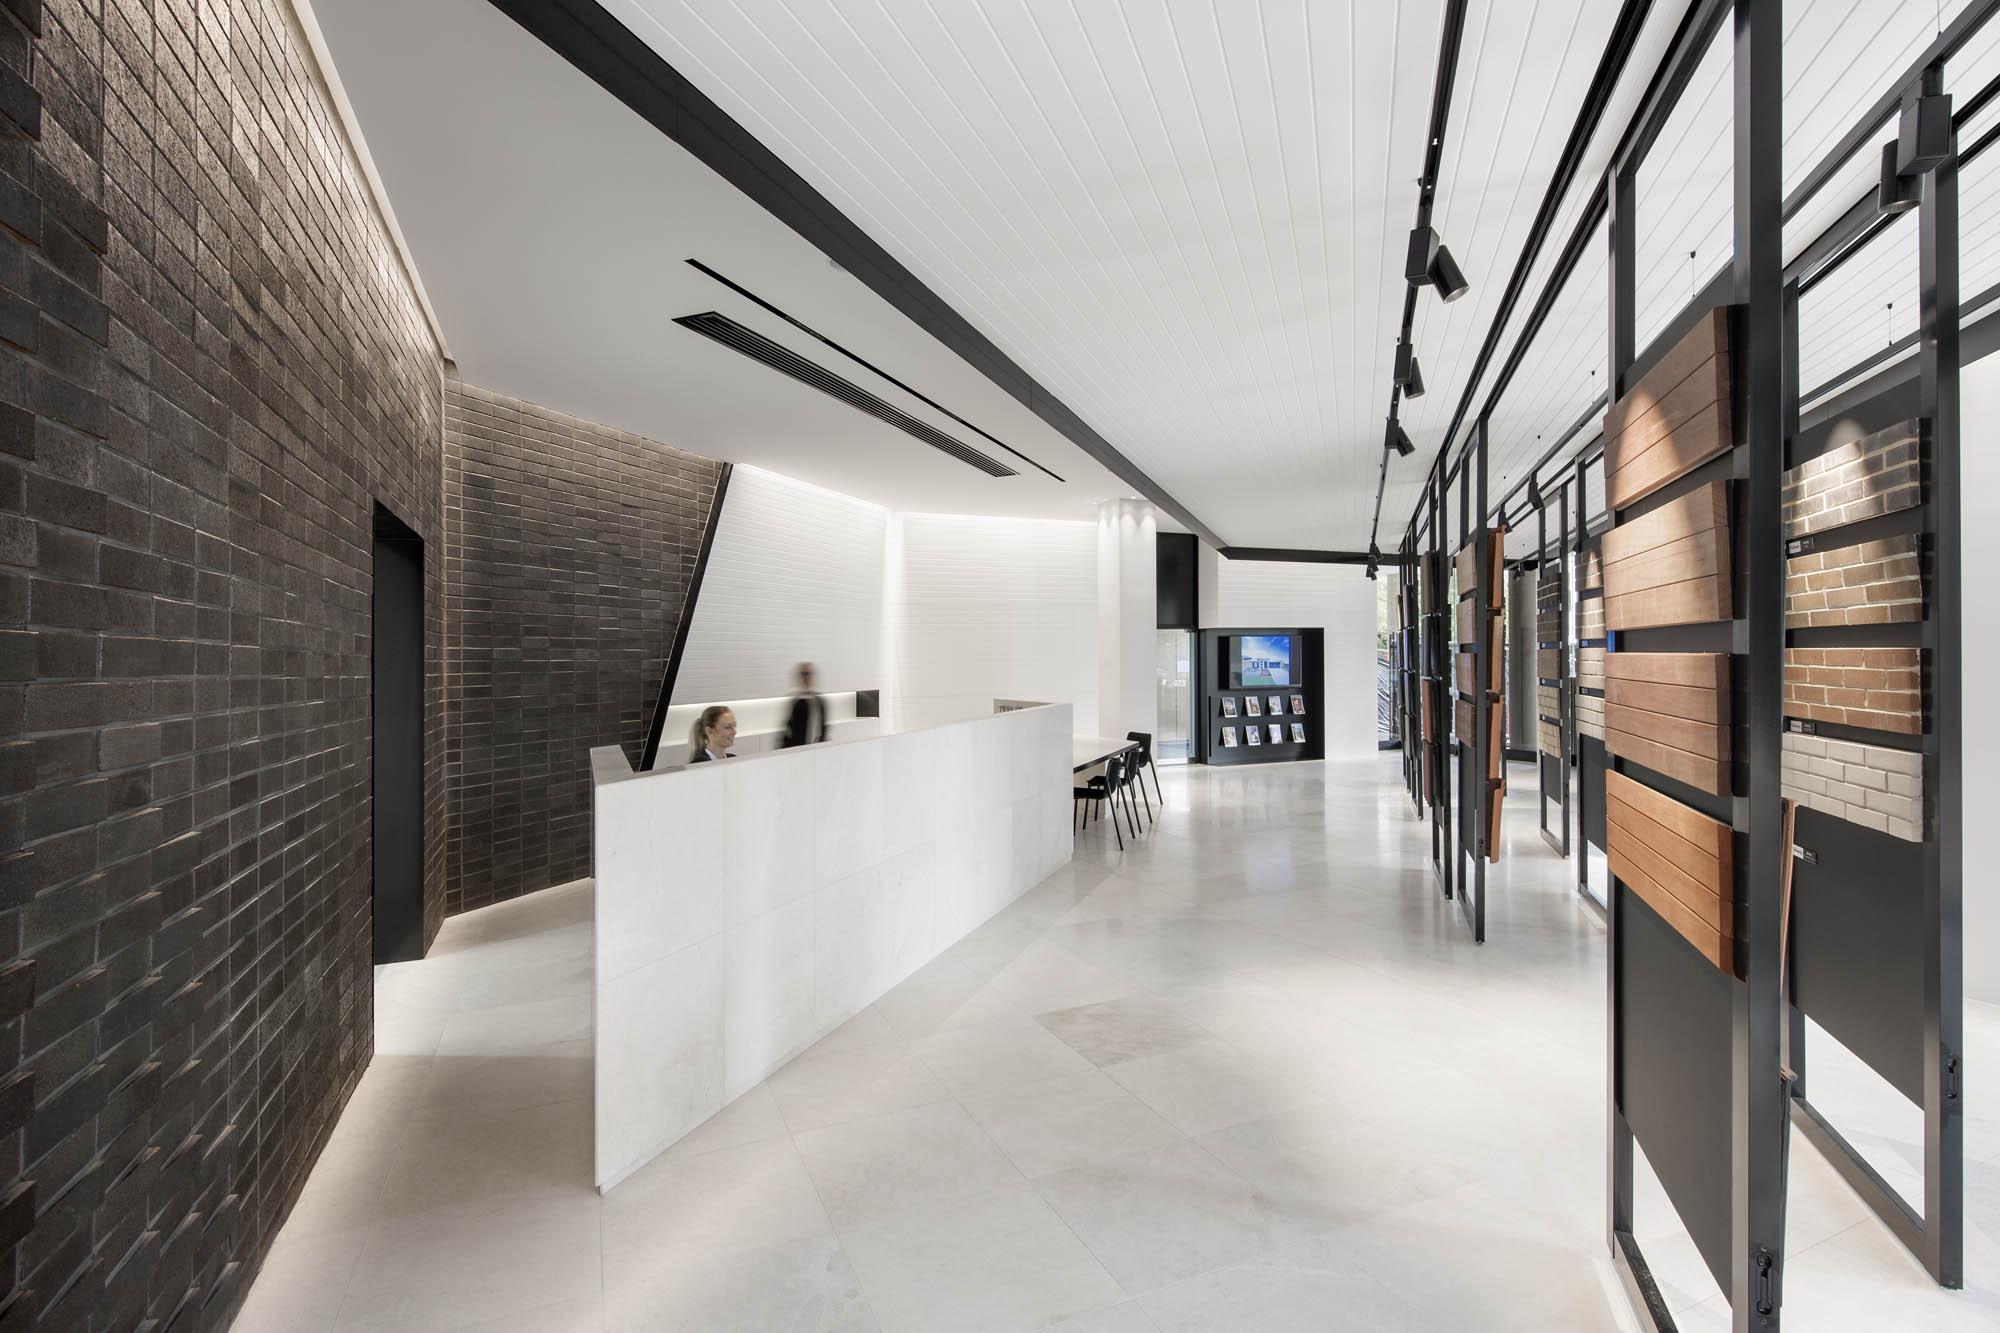 carousel brickwork design austral brick studio adelaide fitout construction reception retail sliding display